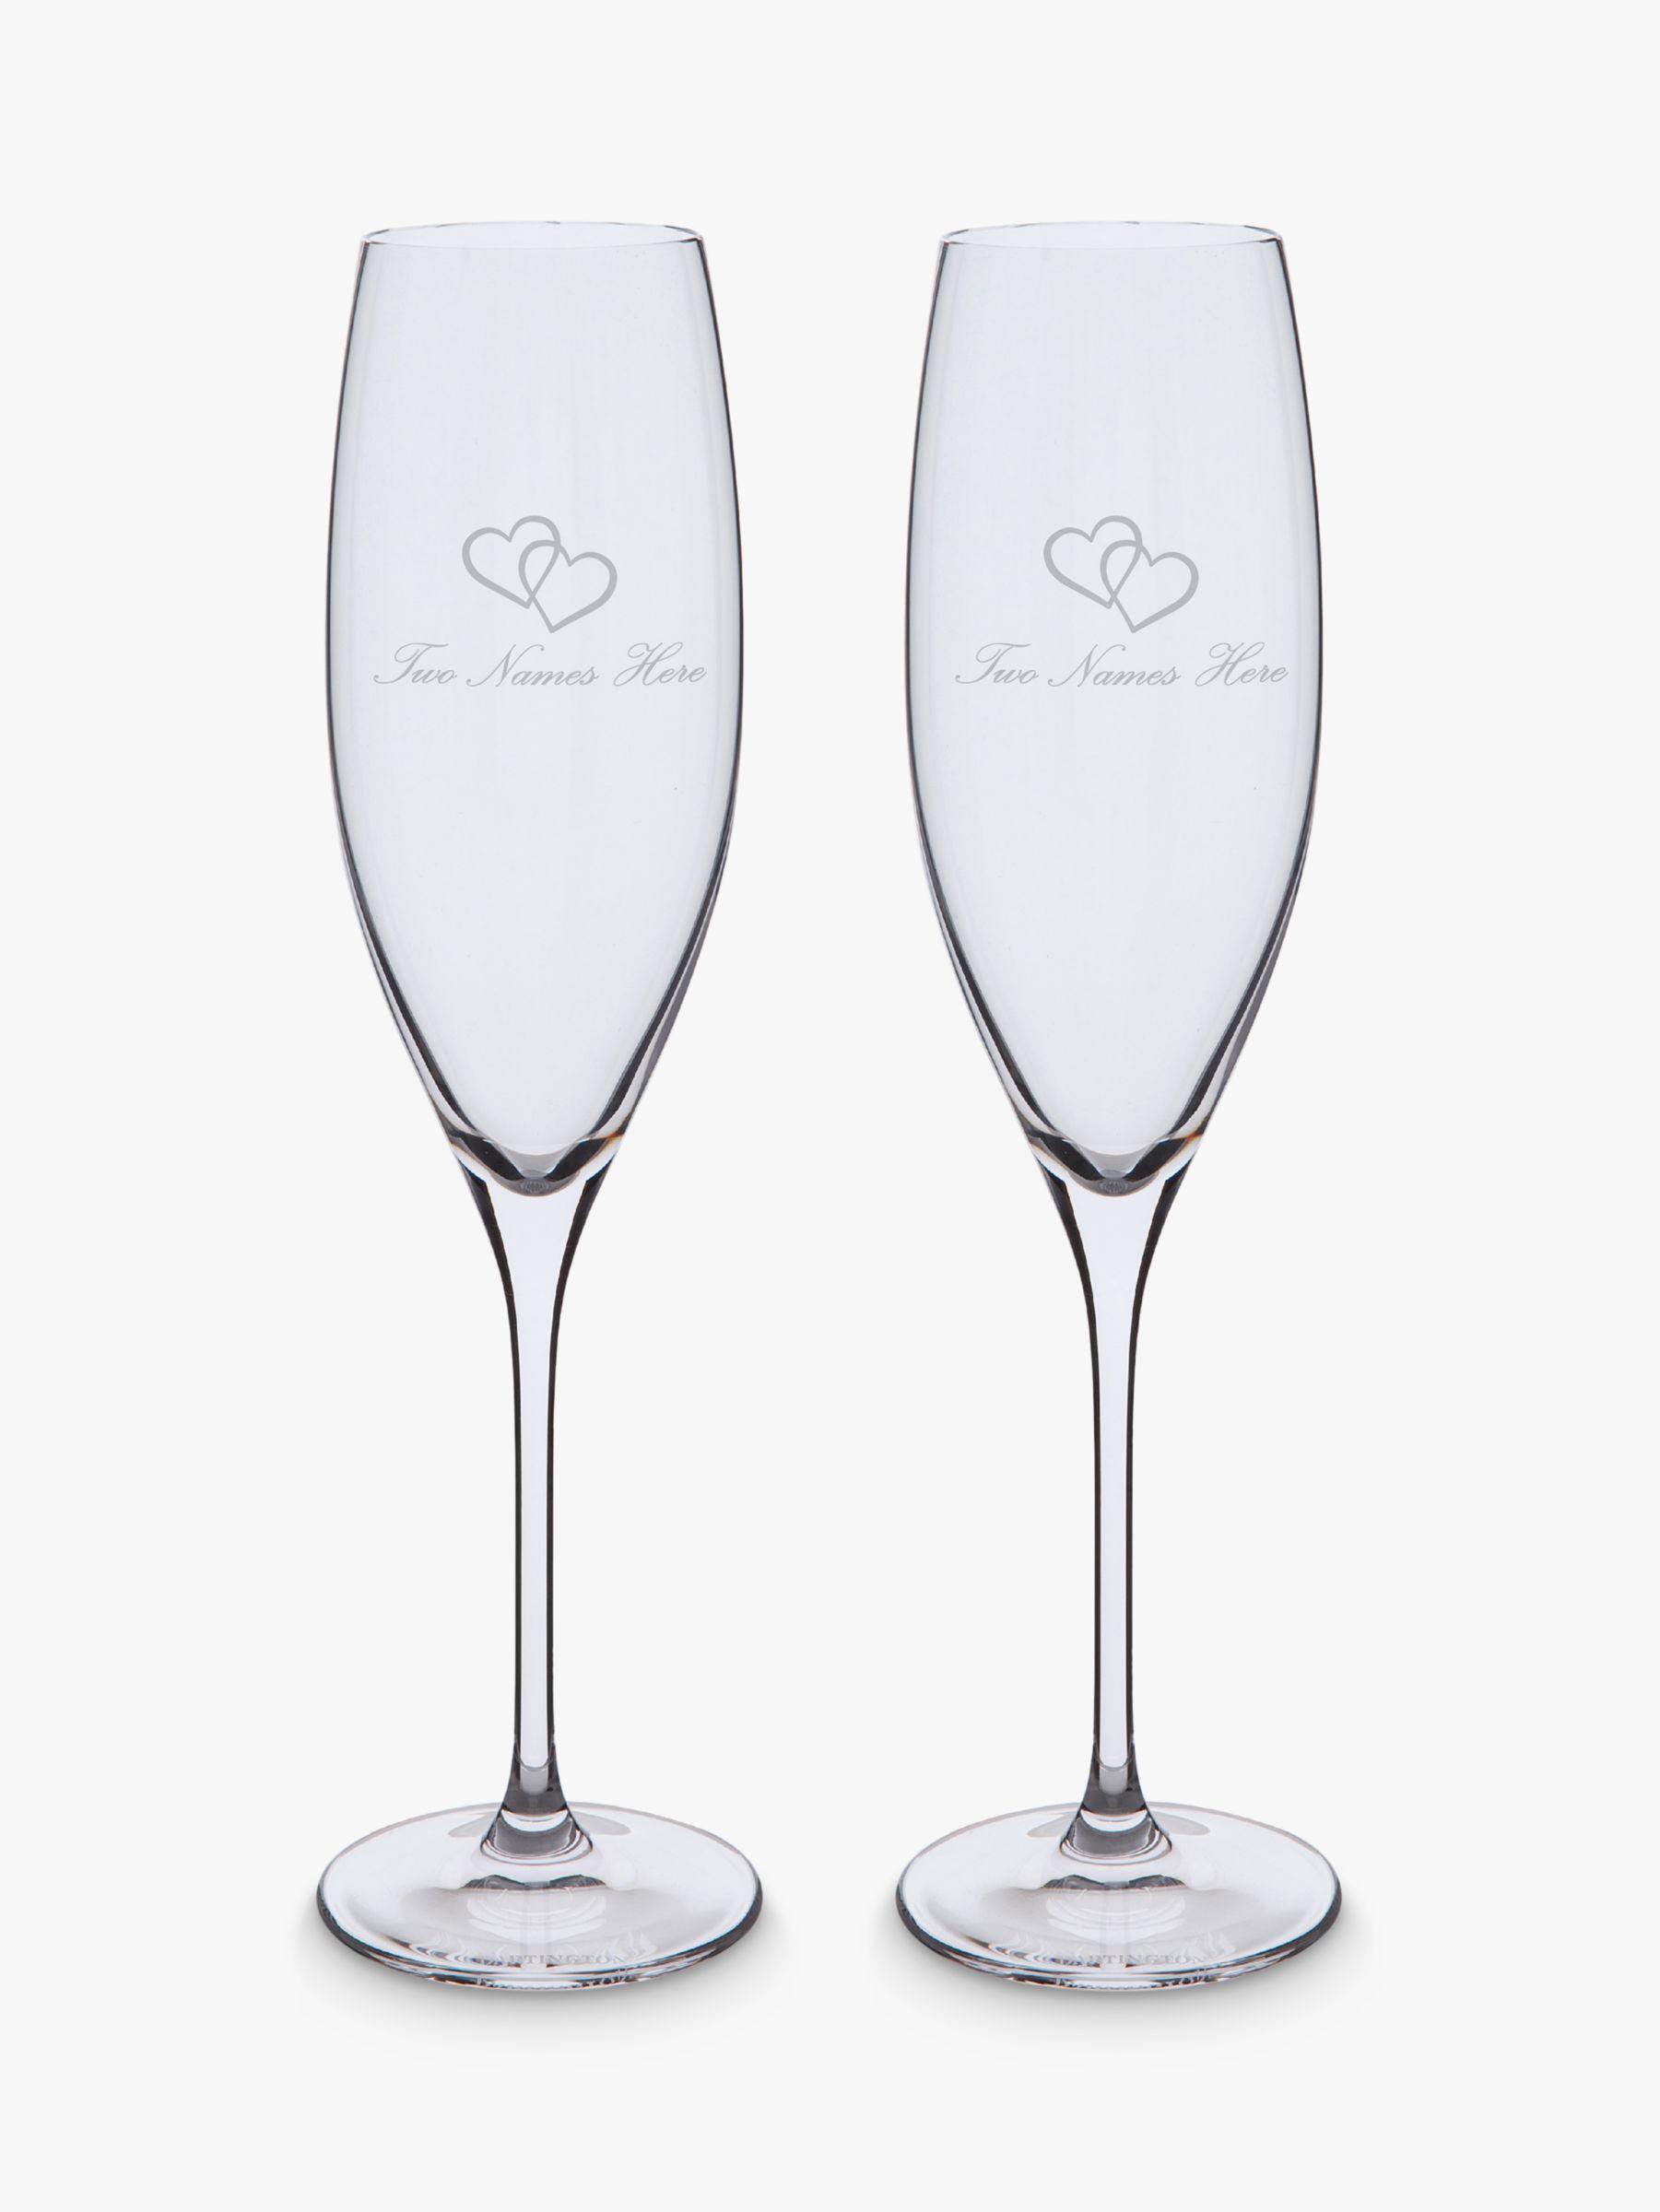 Dartington Crystal Dartington Crystal Personalised Love Heart Flutes, Set of 2, 200ml, Palace Script Font, Clear